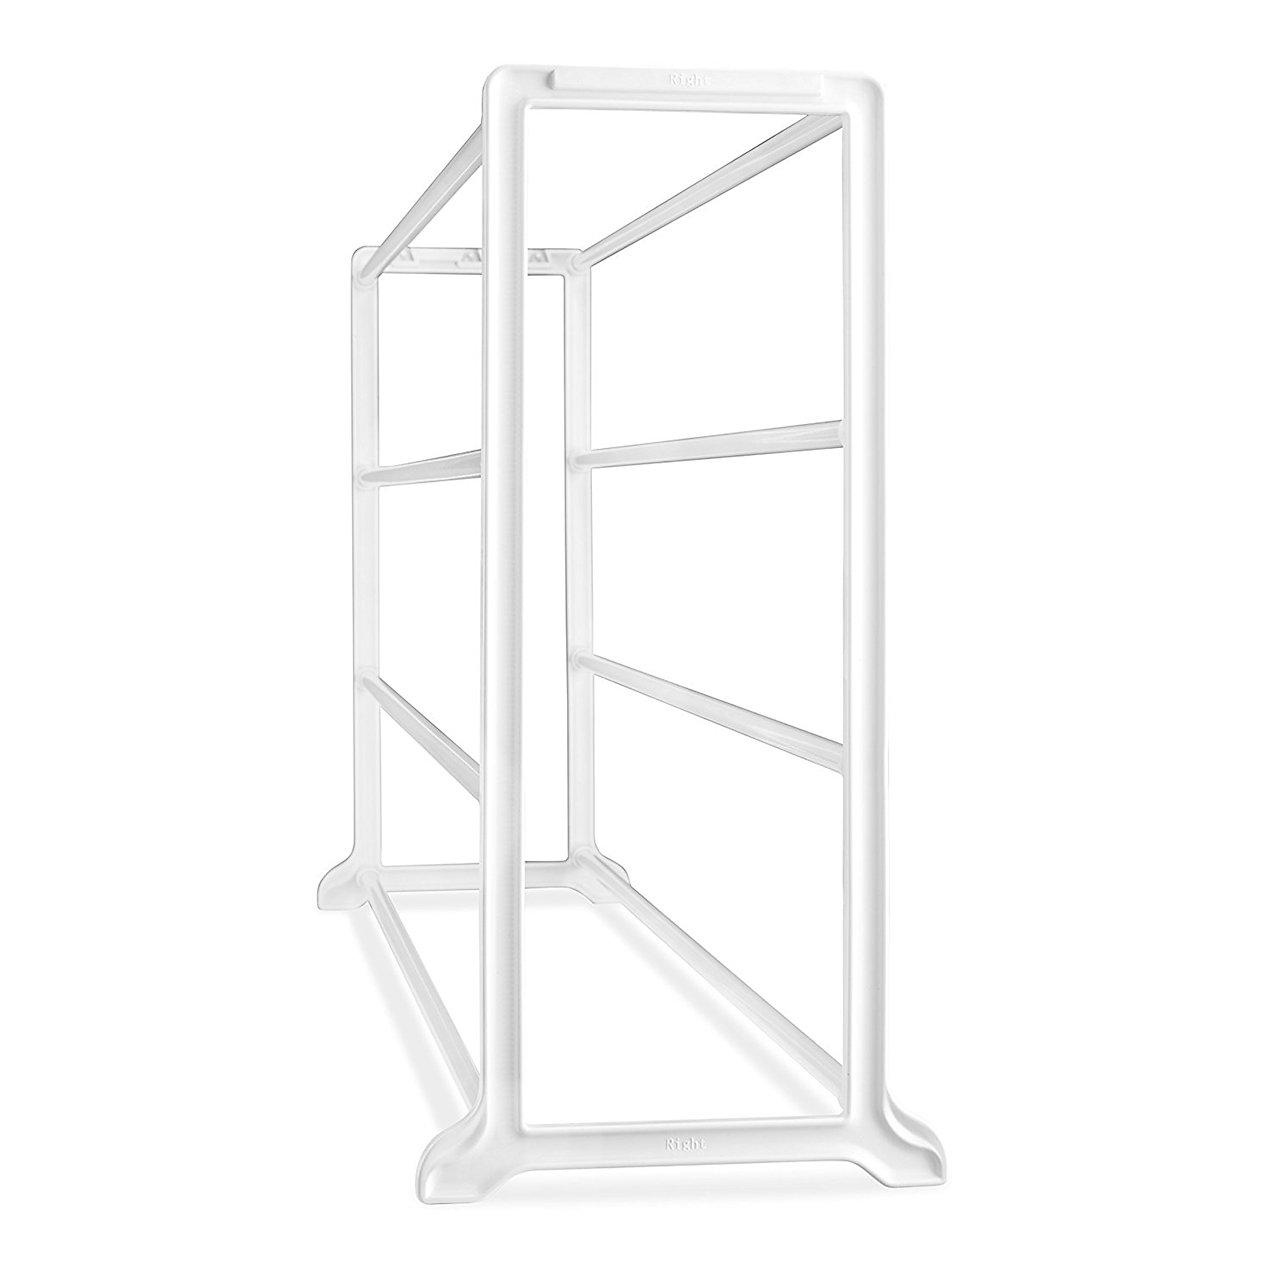 White SortWise /® 4-Tier Floor Stand Shoe Rack Organizer 20 Pairs Shoe Tower Organizer Cabinet Entryway Stackable Storage Shelf Unit 35 7//16 L x 9 1//16 W x 9 1//16 H